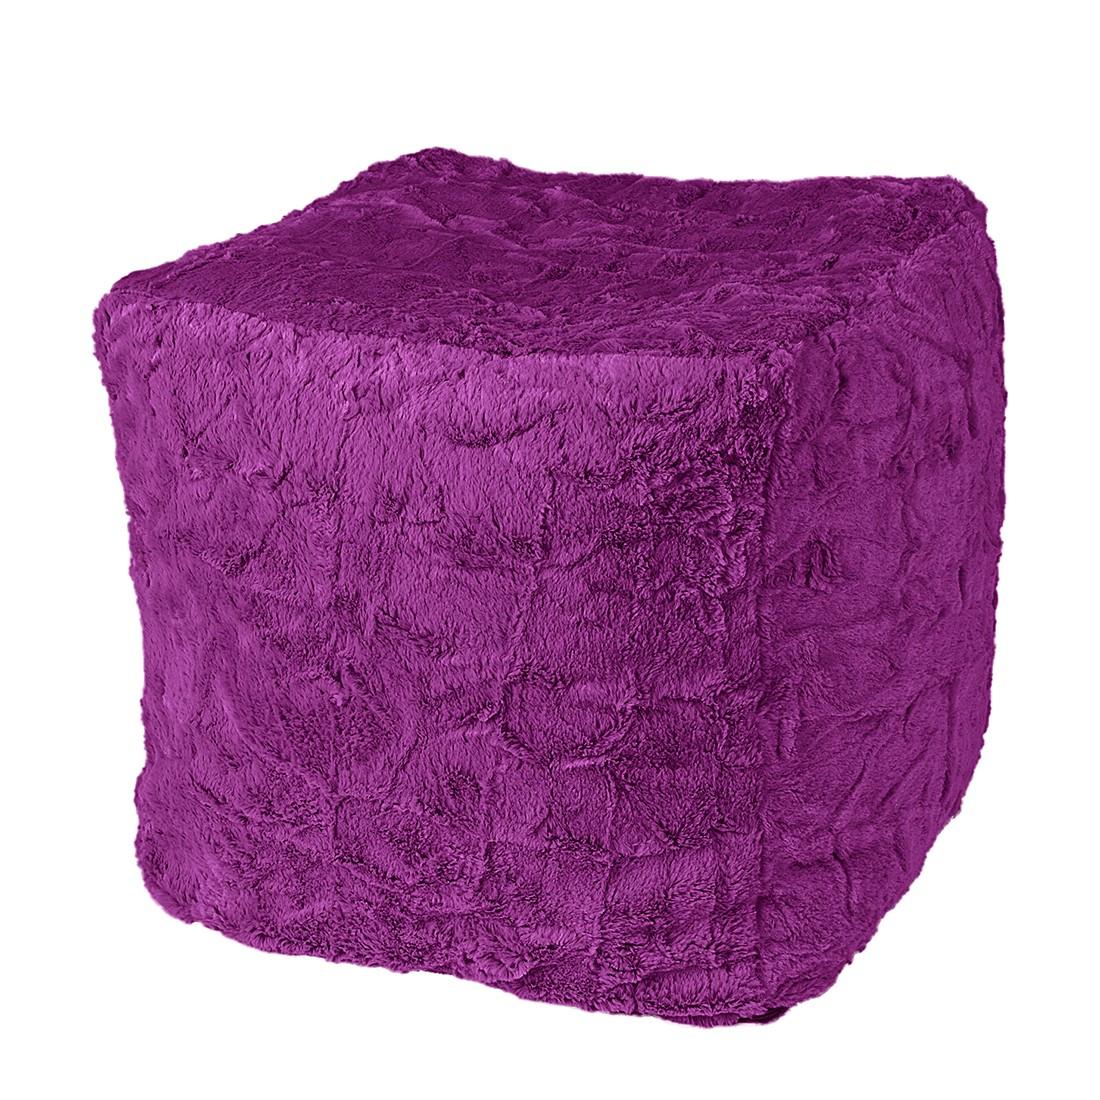 Sitzwürfel Cube Fluffy – Webplüsch – Violett, Fredriks online bestellen